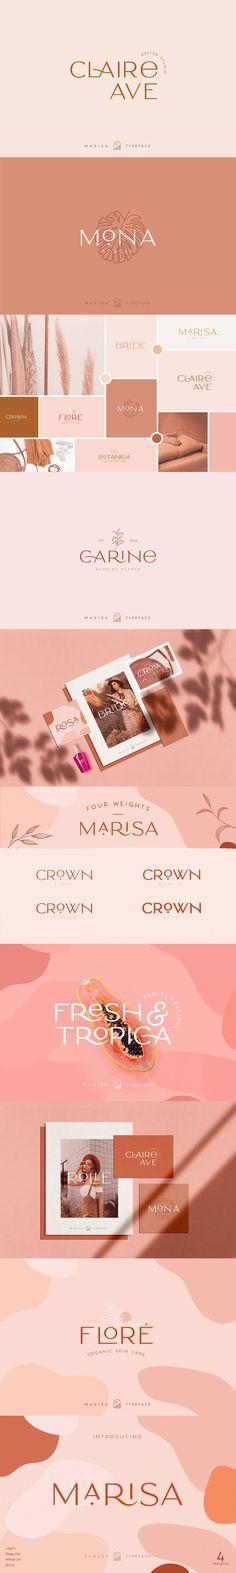 Classy Marisa - Elegant Typeface - Web & Graphic Design on SVG Ninja Elegant Fonts, Roman Fonts, Wedding Fonts, Vintage Fonts, New Fonts, Modern Minimalist, Ninja, Classy, Graphic Design